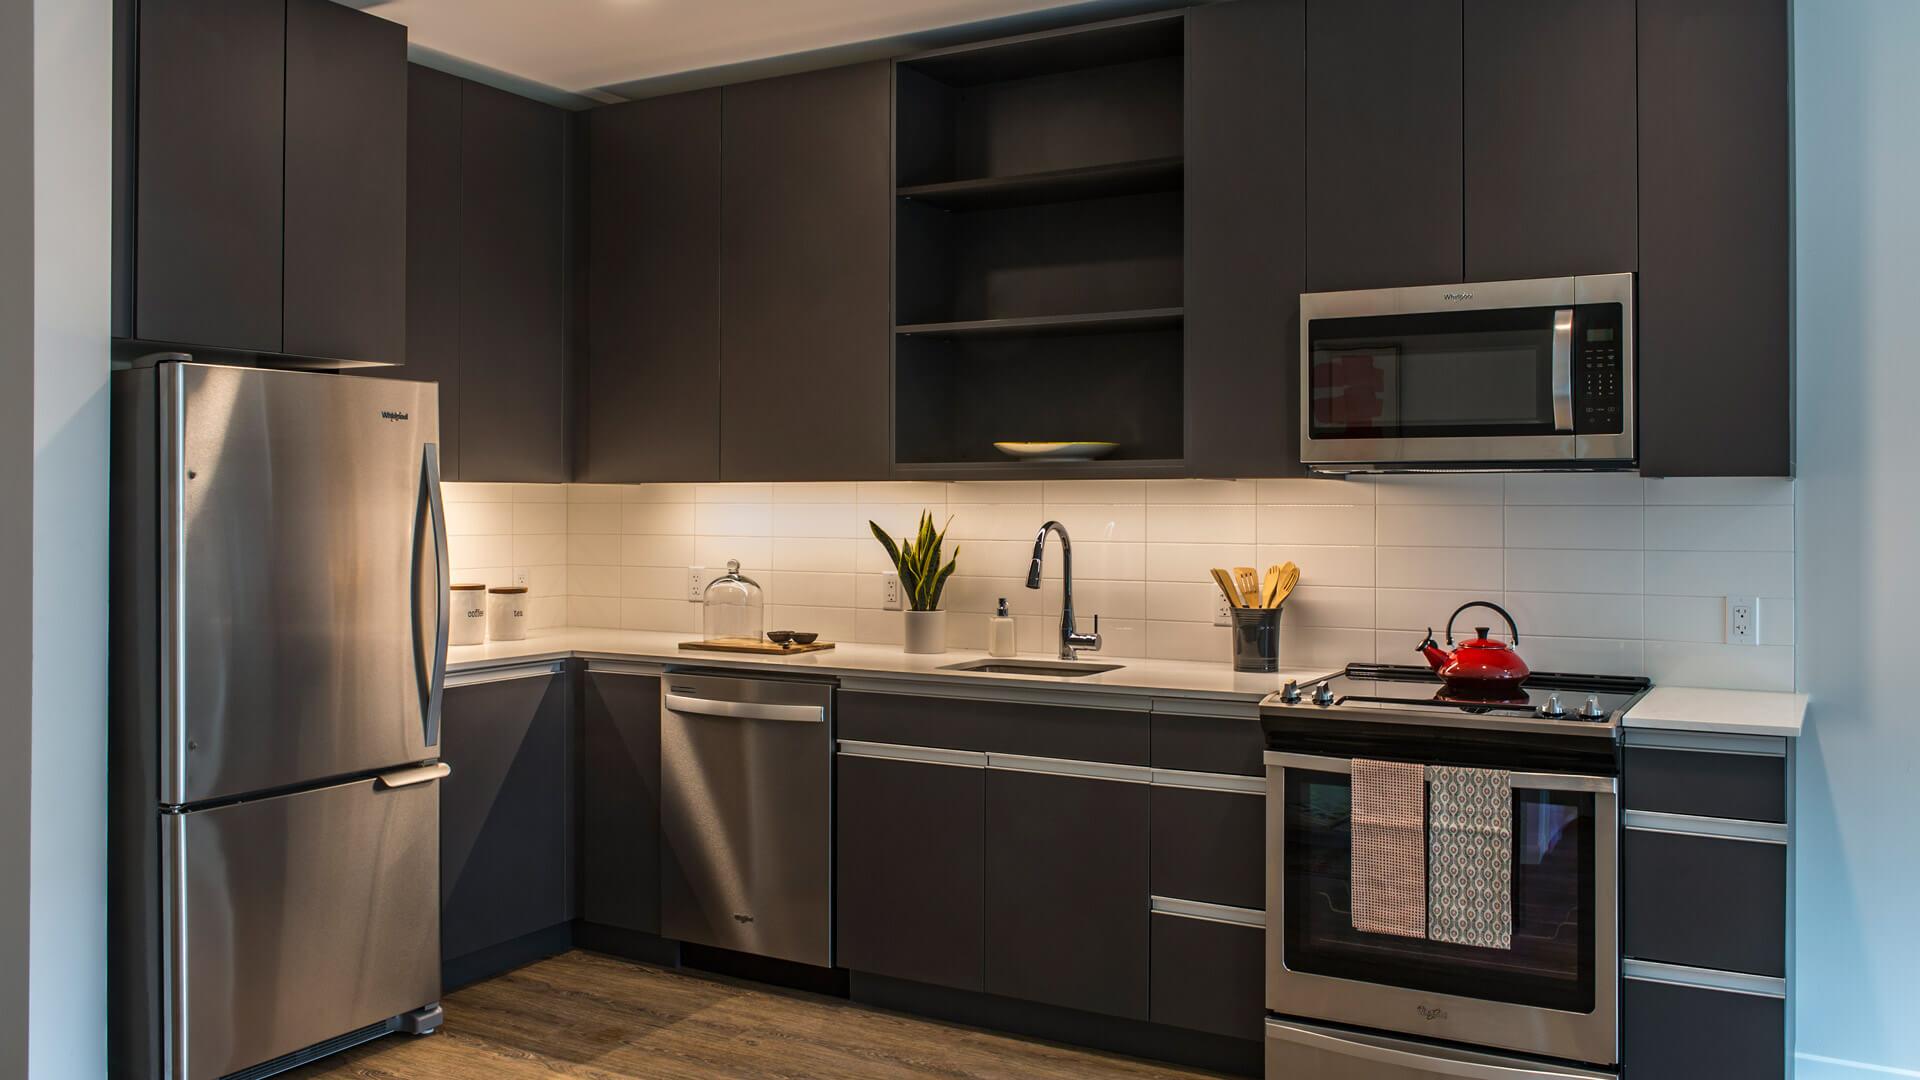 Apartments img 35